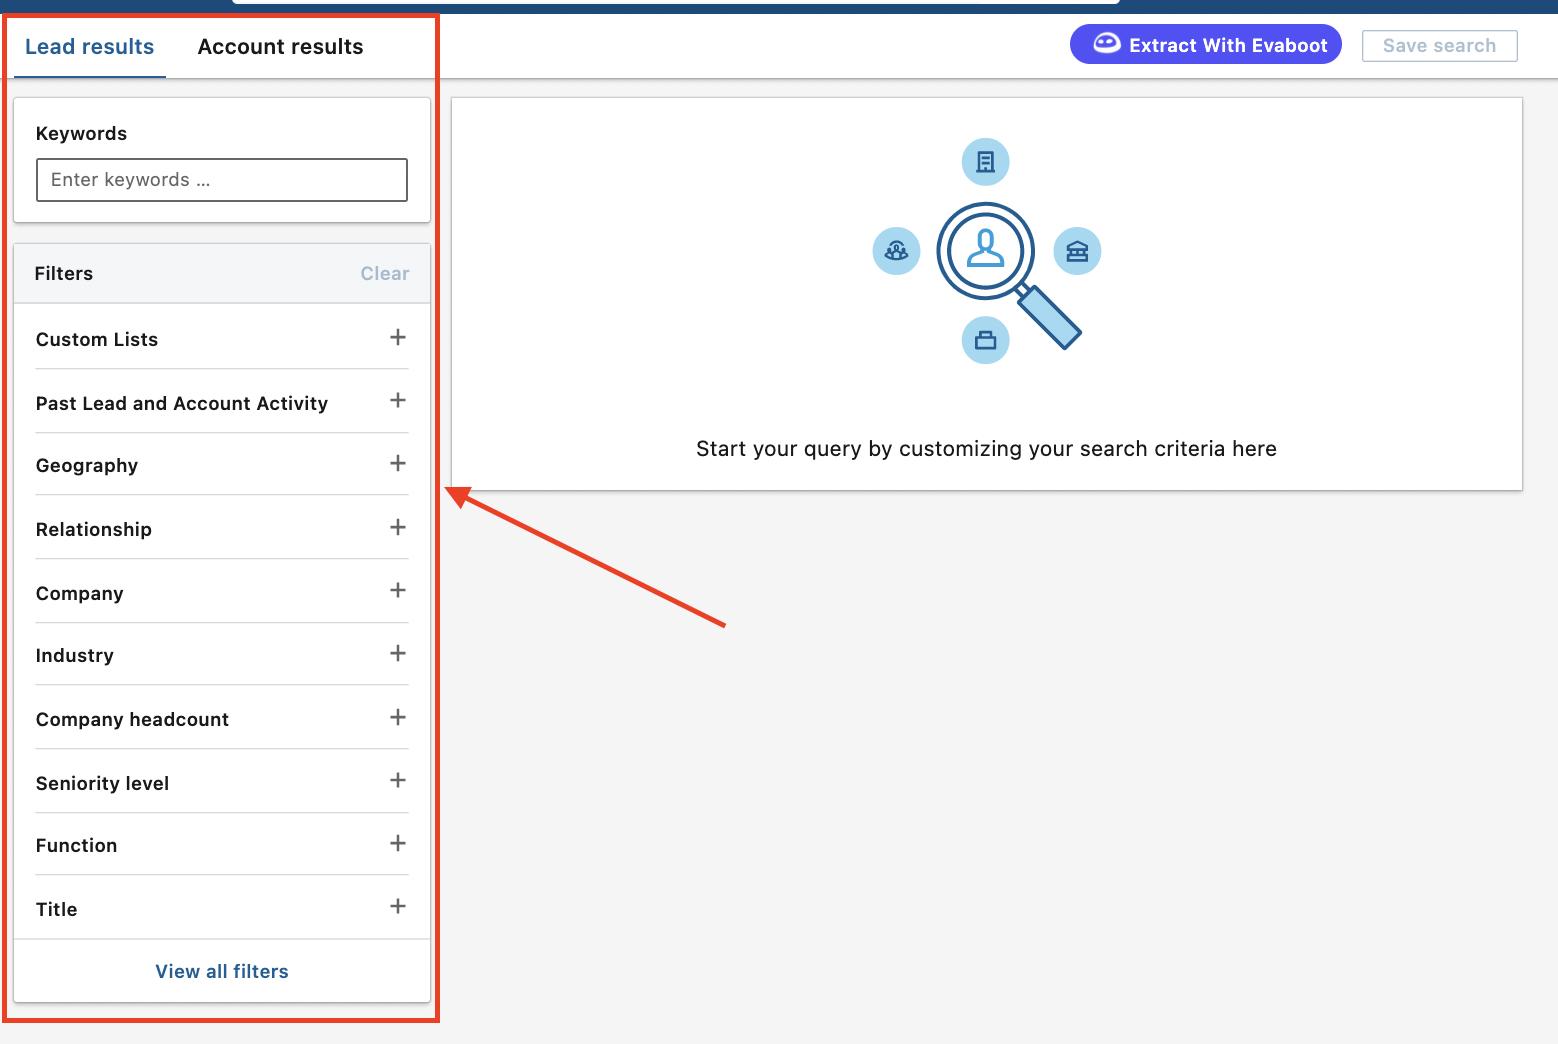 linkedin-sales-navigator-advanced-filters.png